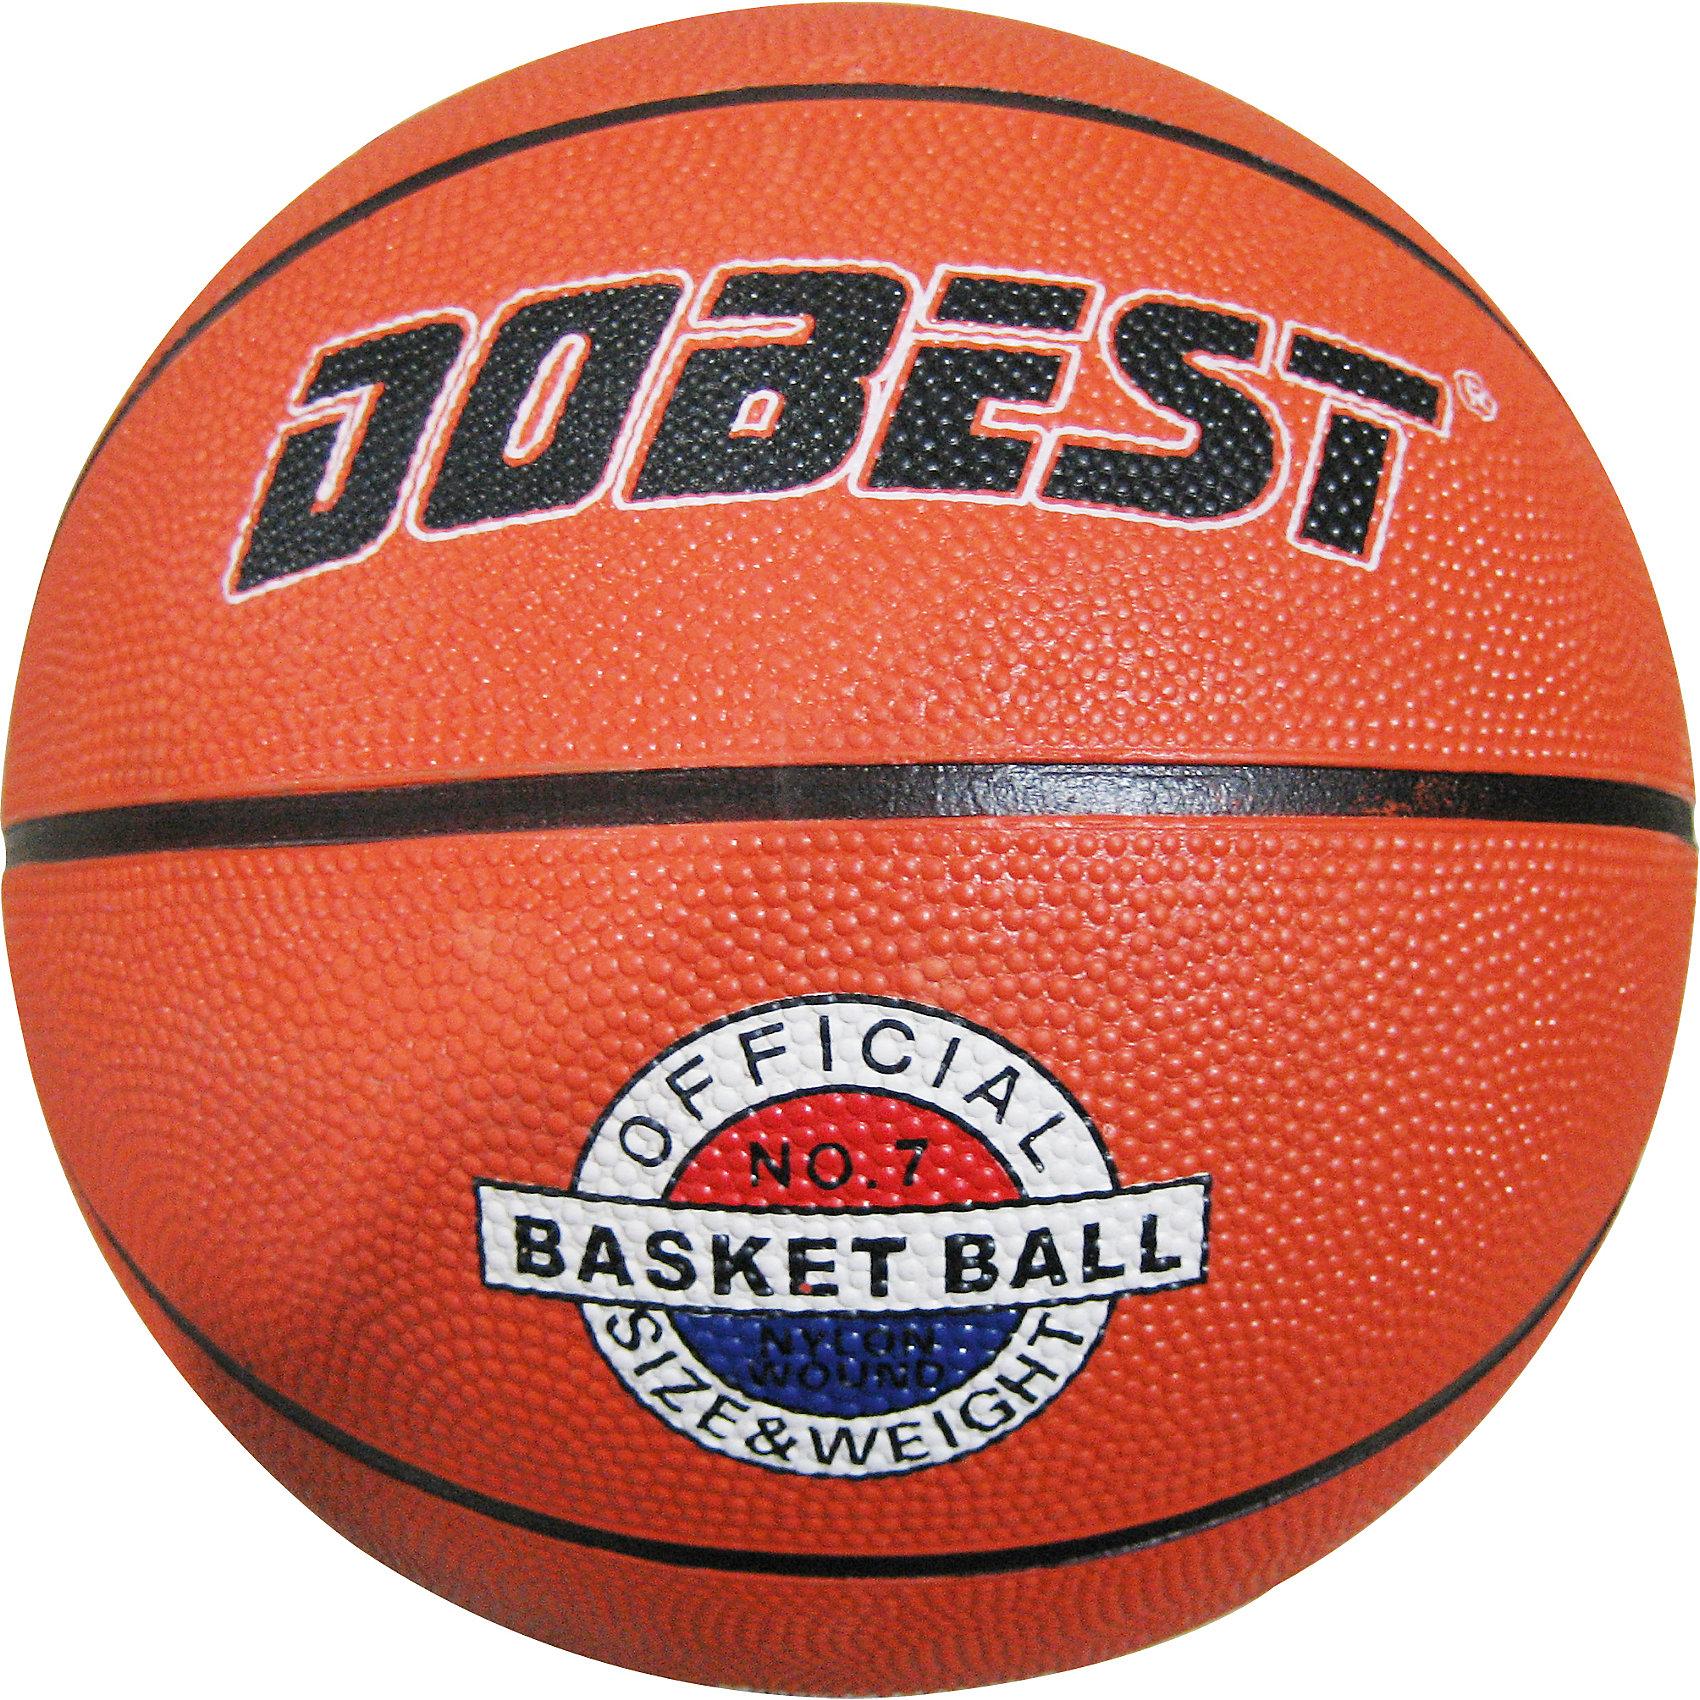 Баскетбольный мяч RB7-0886, р.7 резина, оранж., Dobest